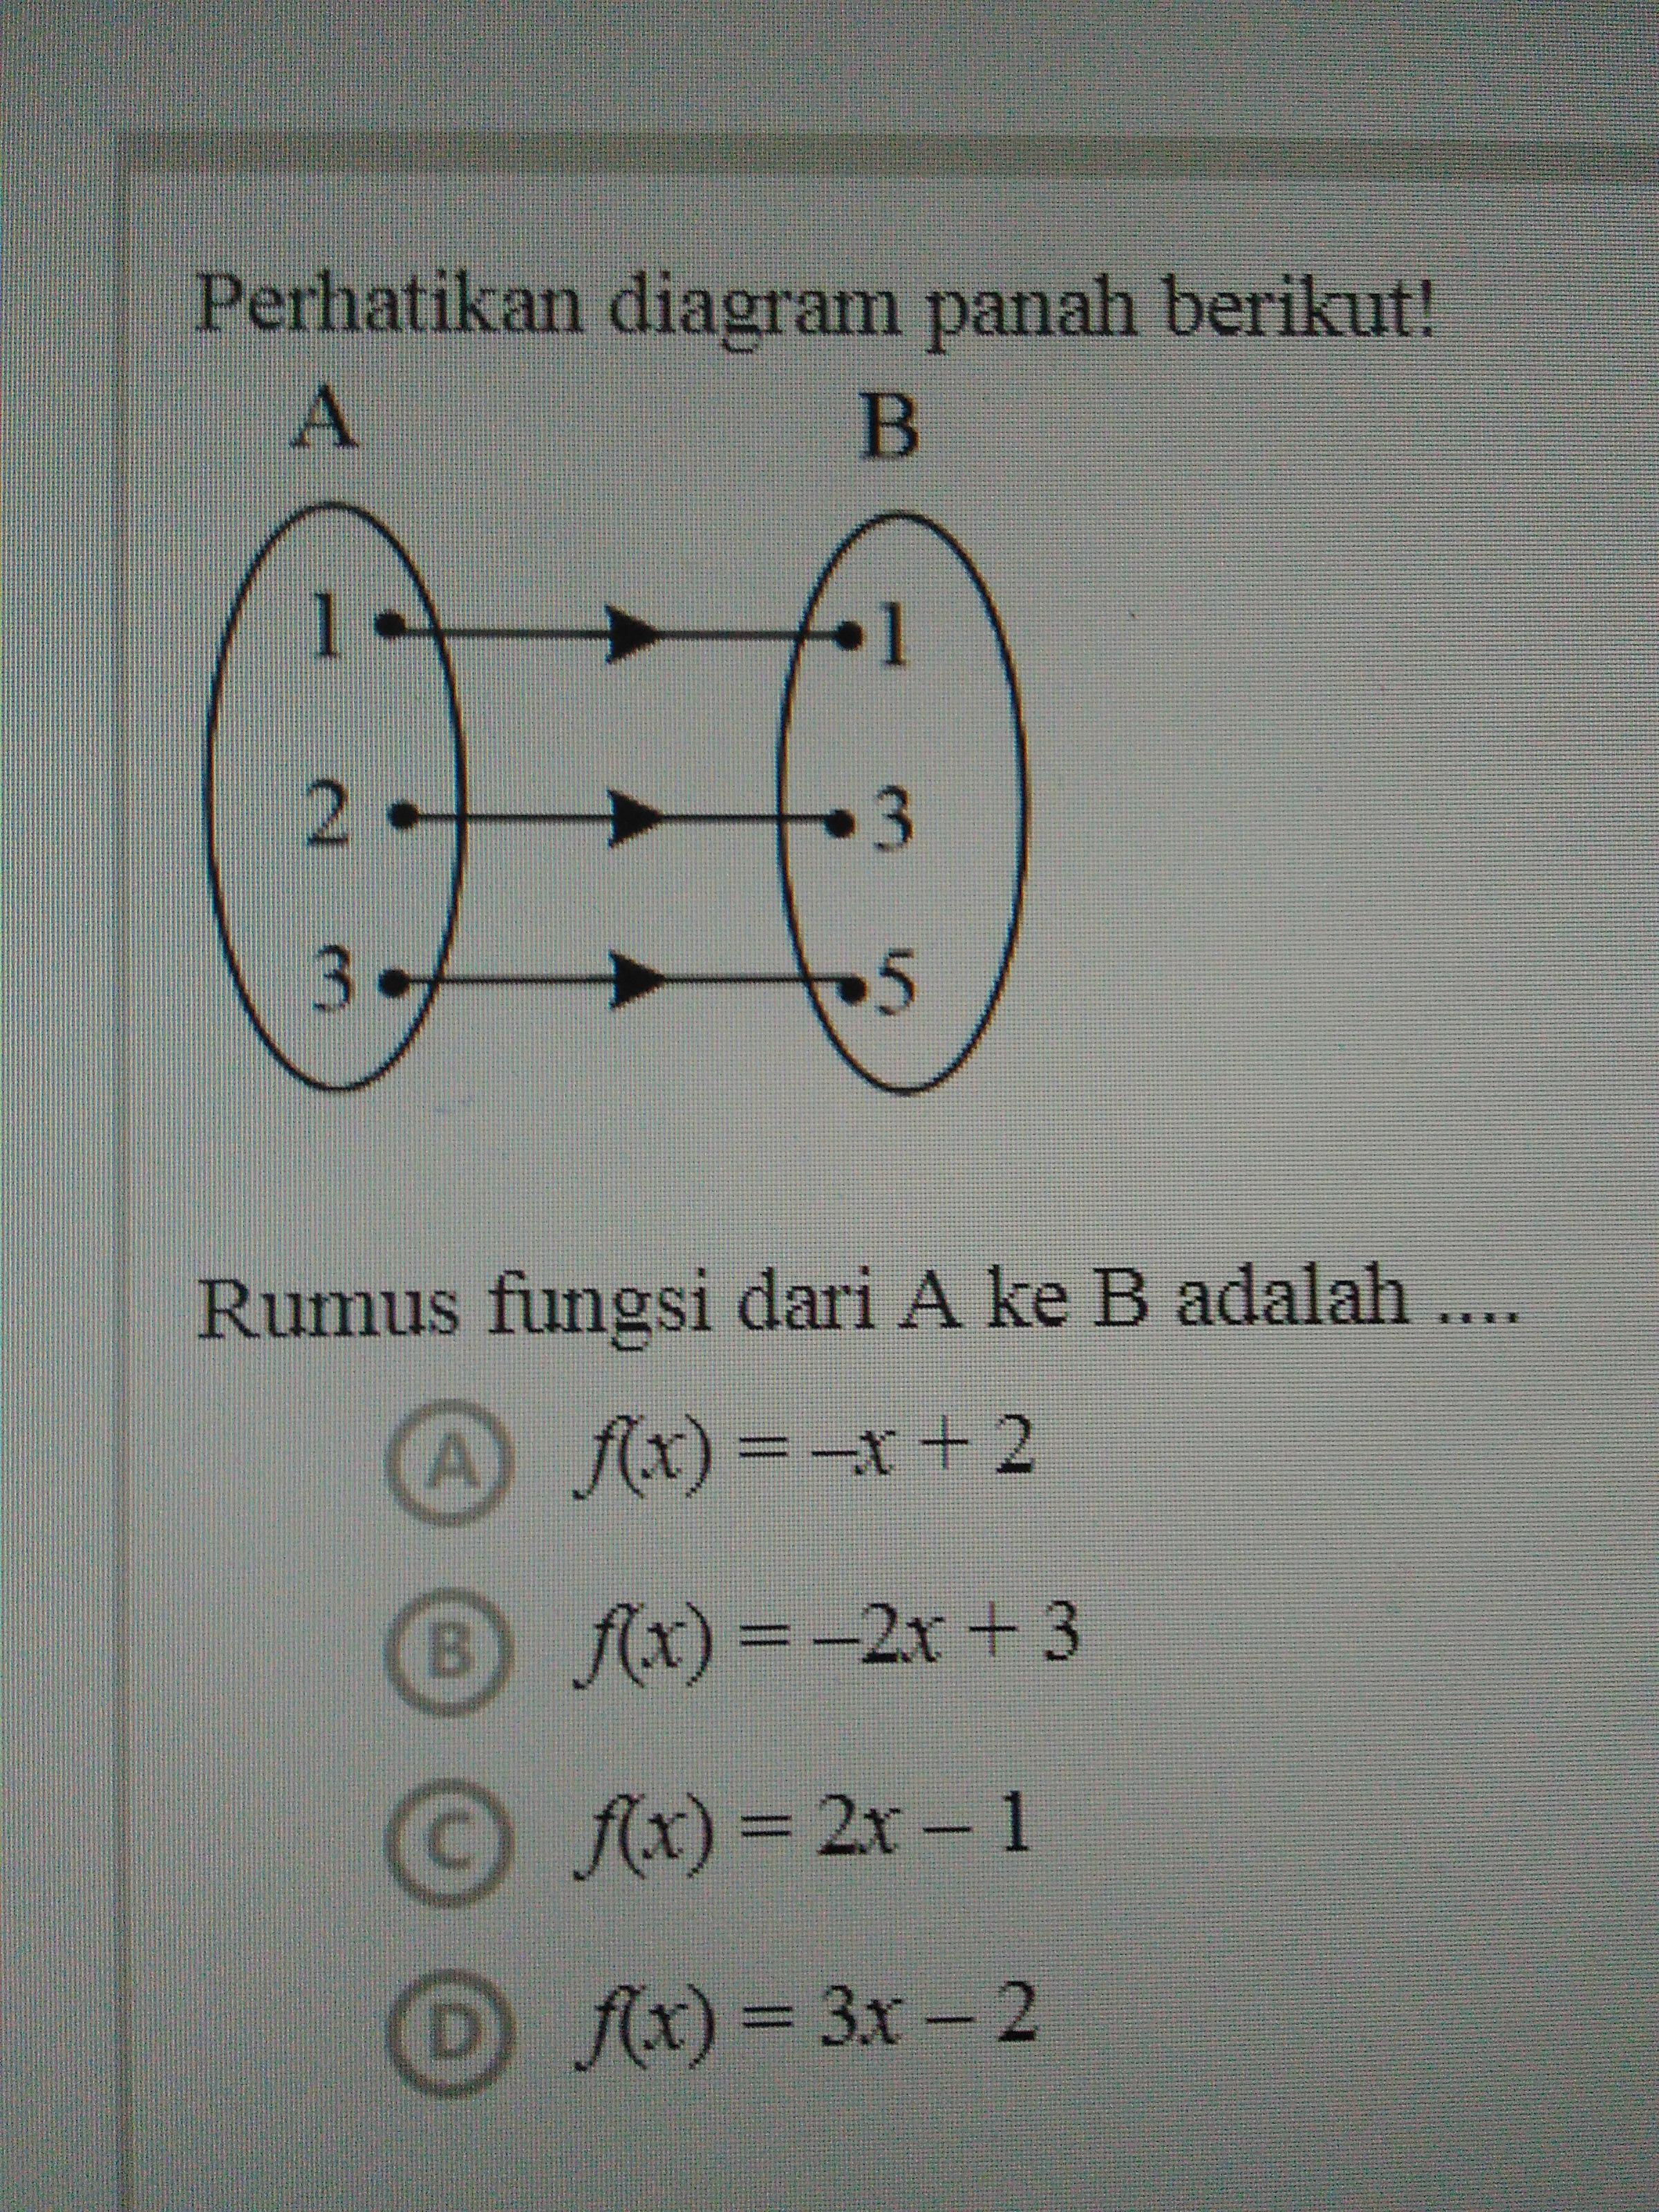 Rumus fungsi dari A ke B adalah.. (ditunjukkan oleh gambar ...